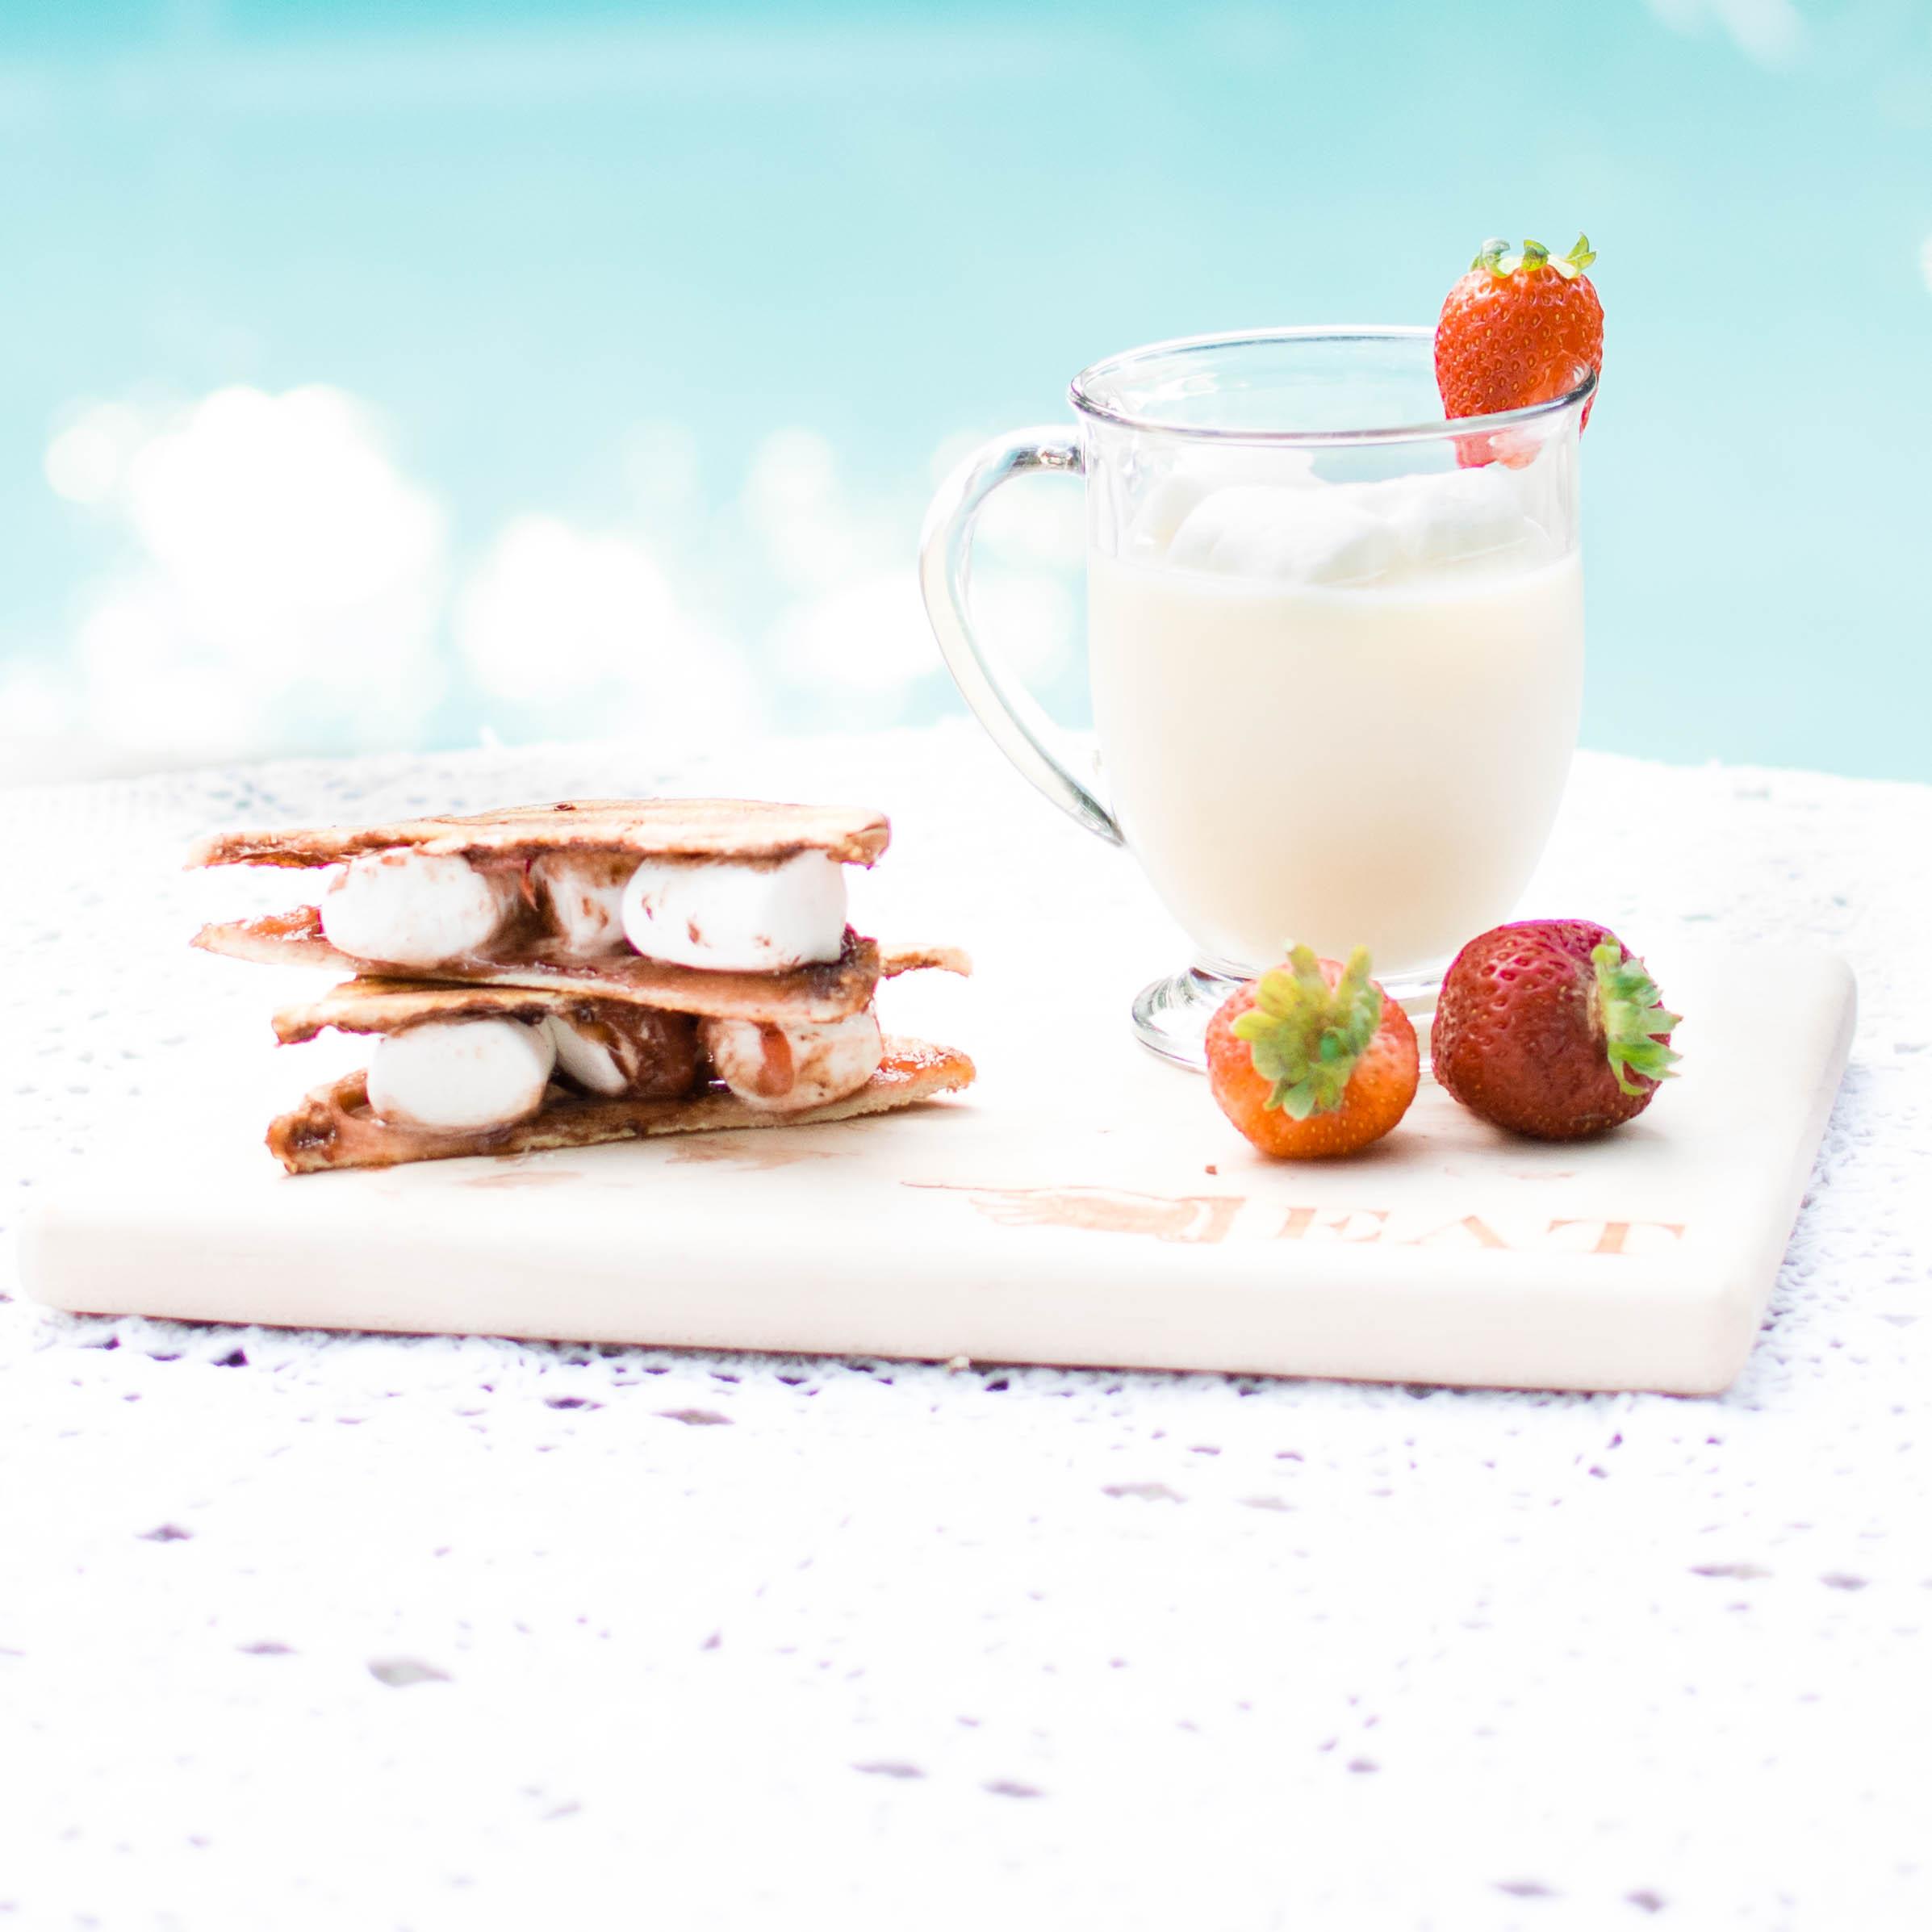 nutella-marshmallows-strawberry-sandwich-loveplayingdressuprecipe